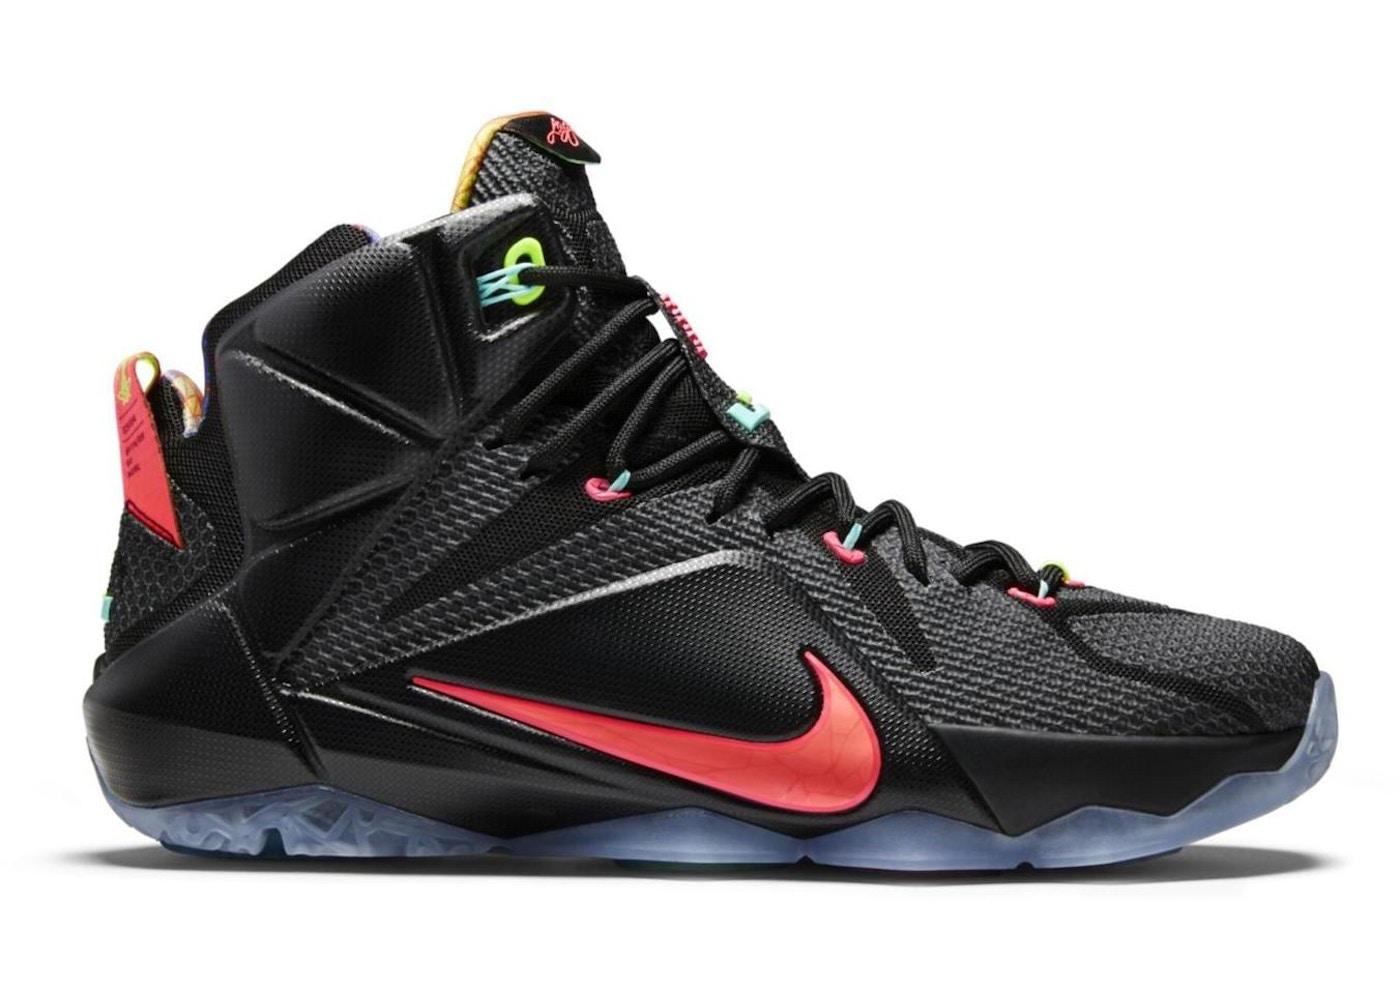 newest 6e58b 173b3 Nike LeBron 12 Shoes - Average Sale Price